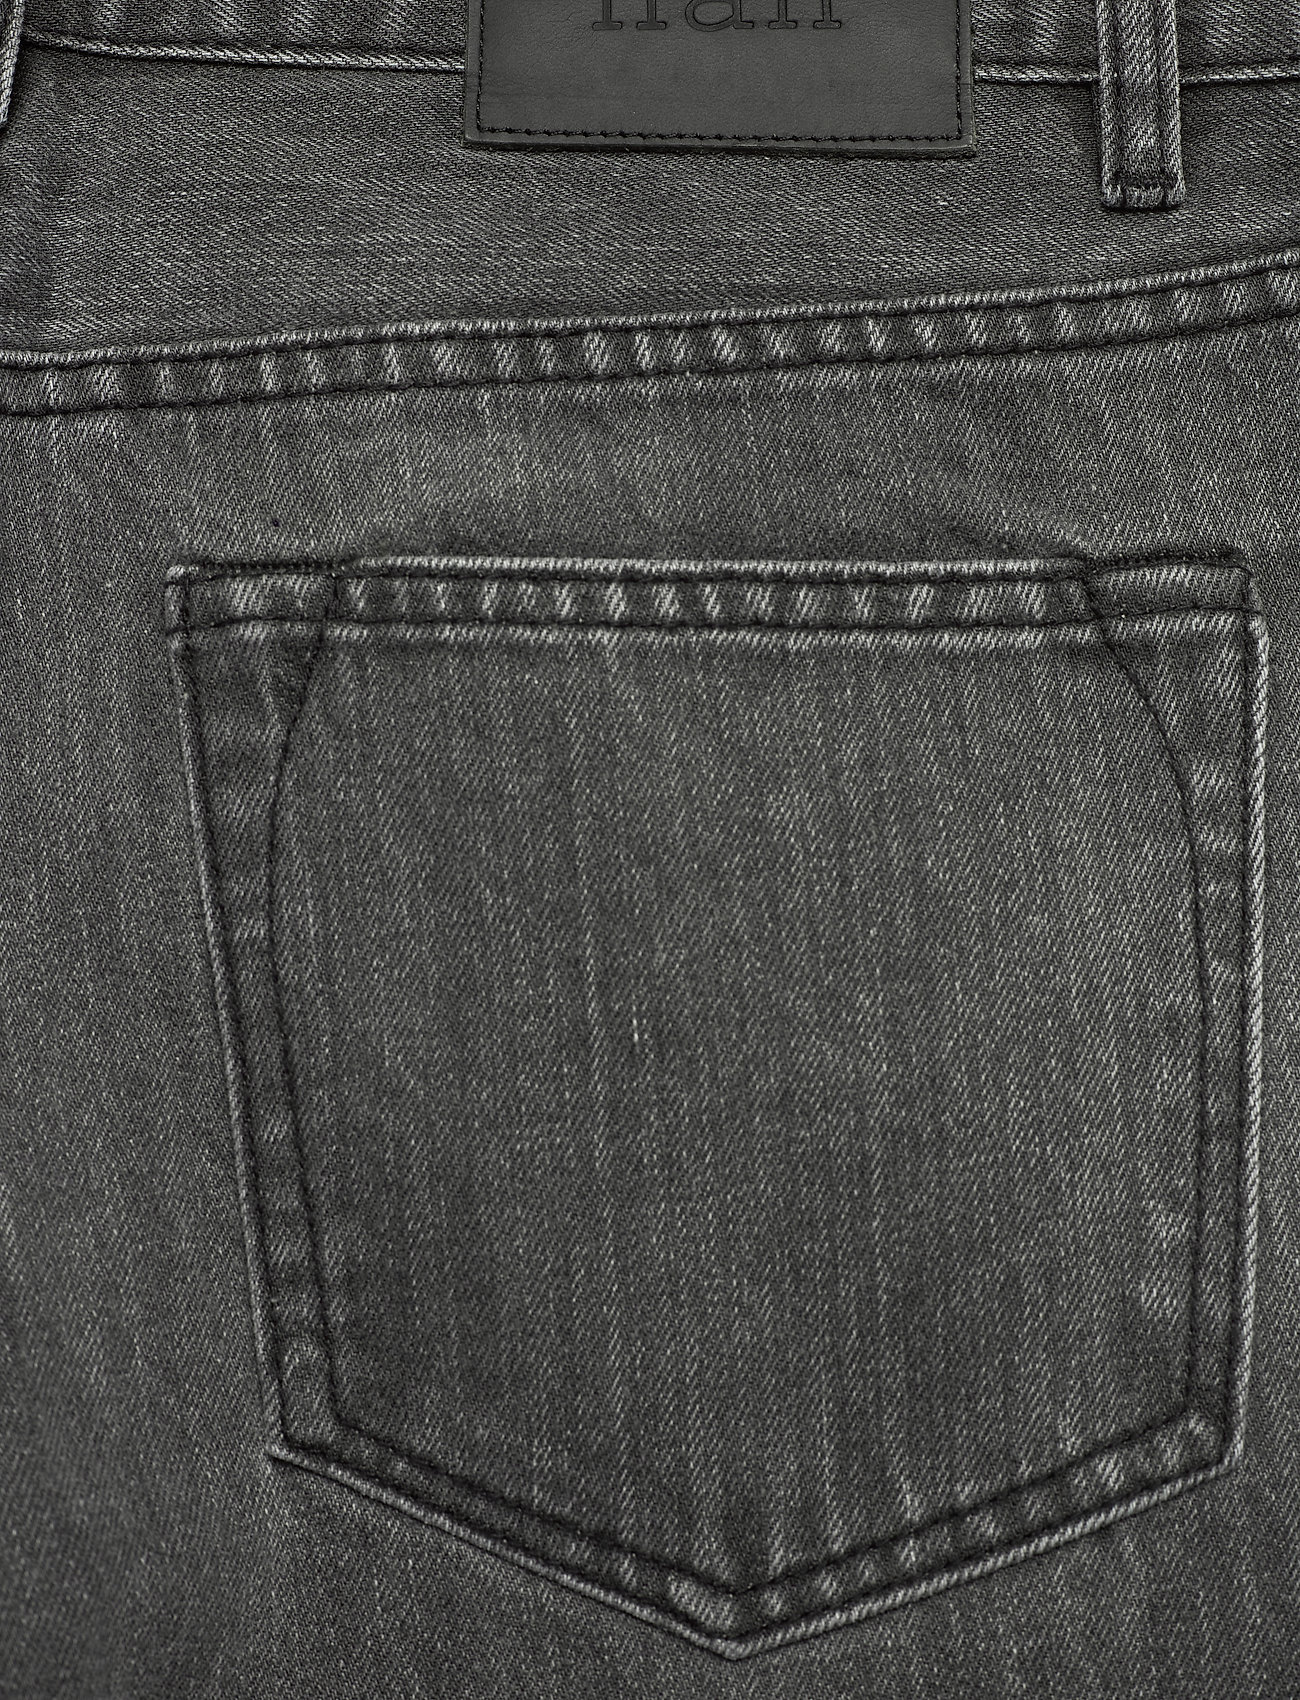 HAN Kjøbenhavn - Tapered Jeans - regular jeans - black stone wash - 4